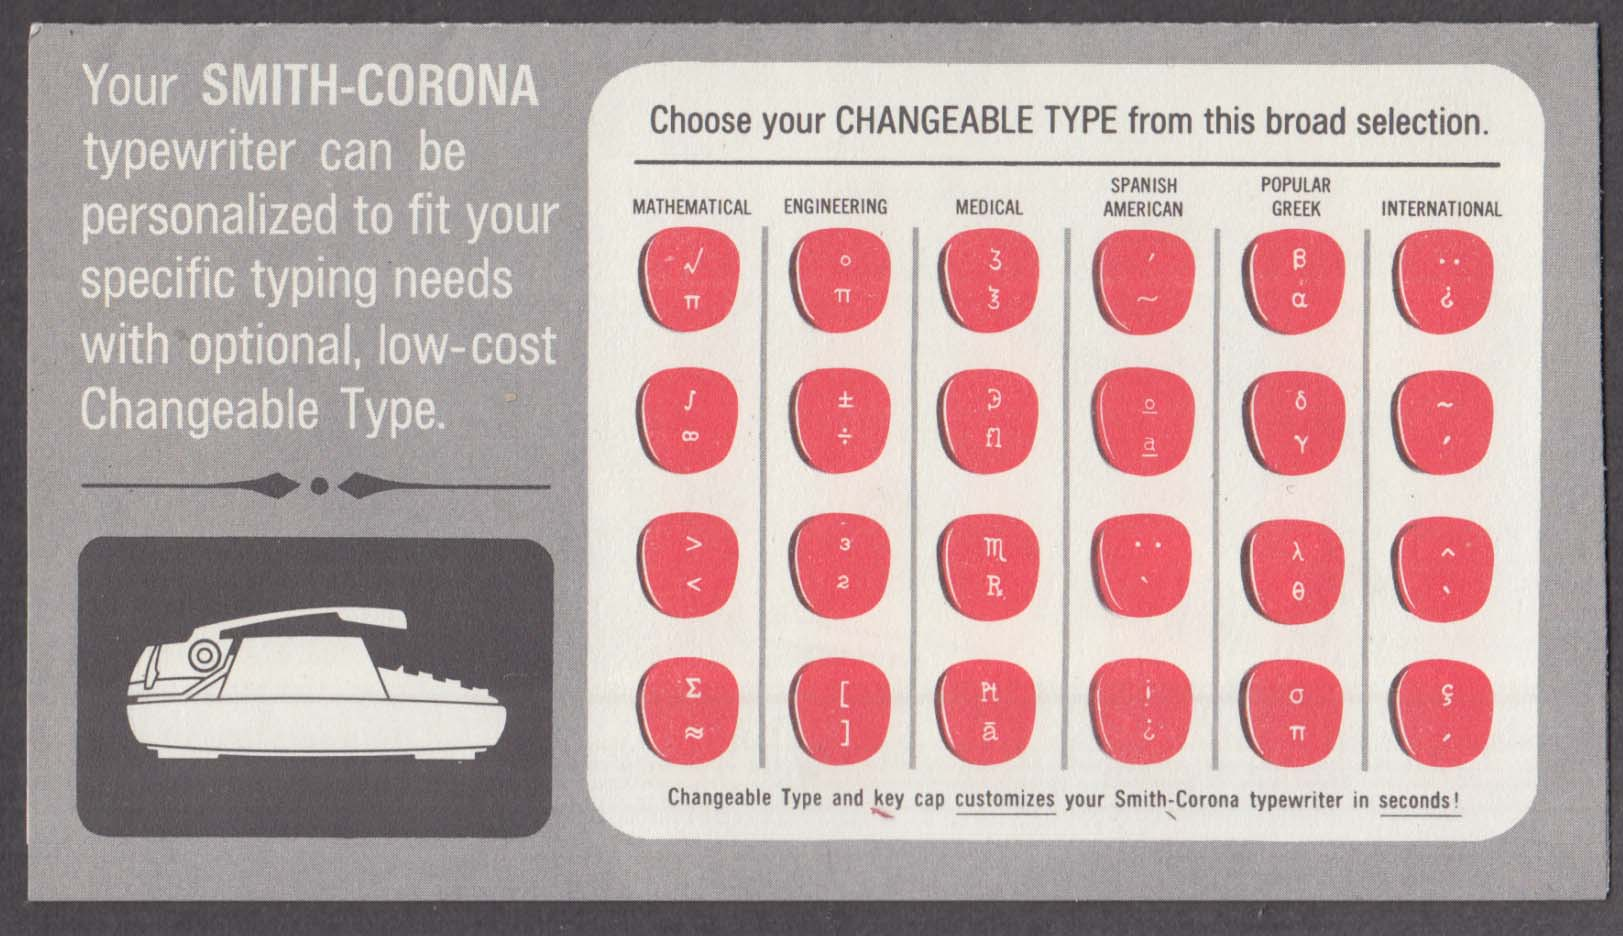 Smith-Corona Typewriter Changeable Type folder order form 1983